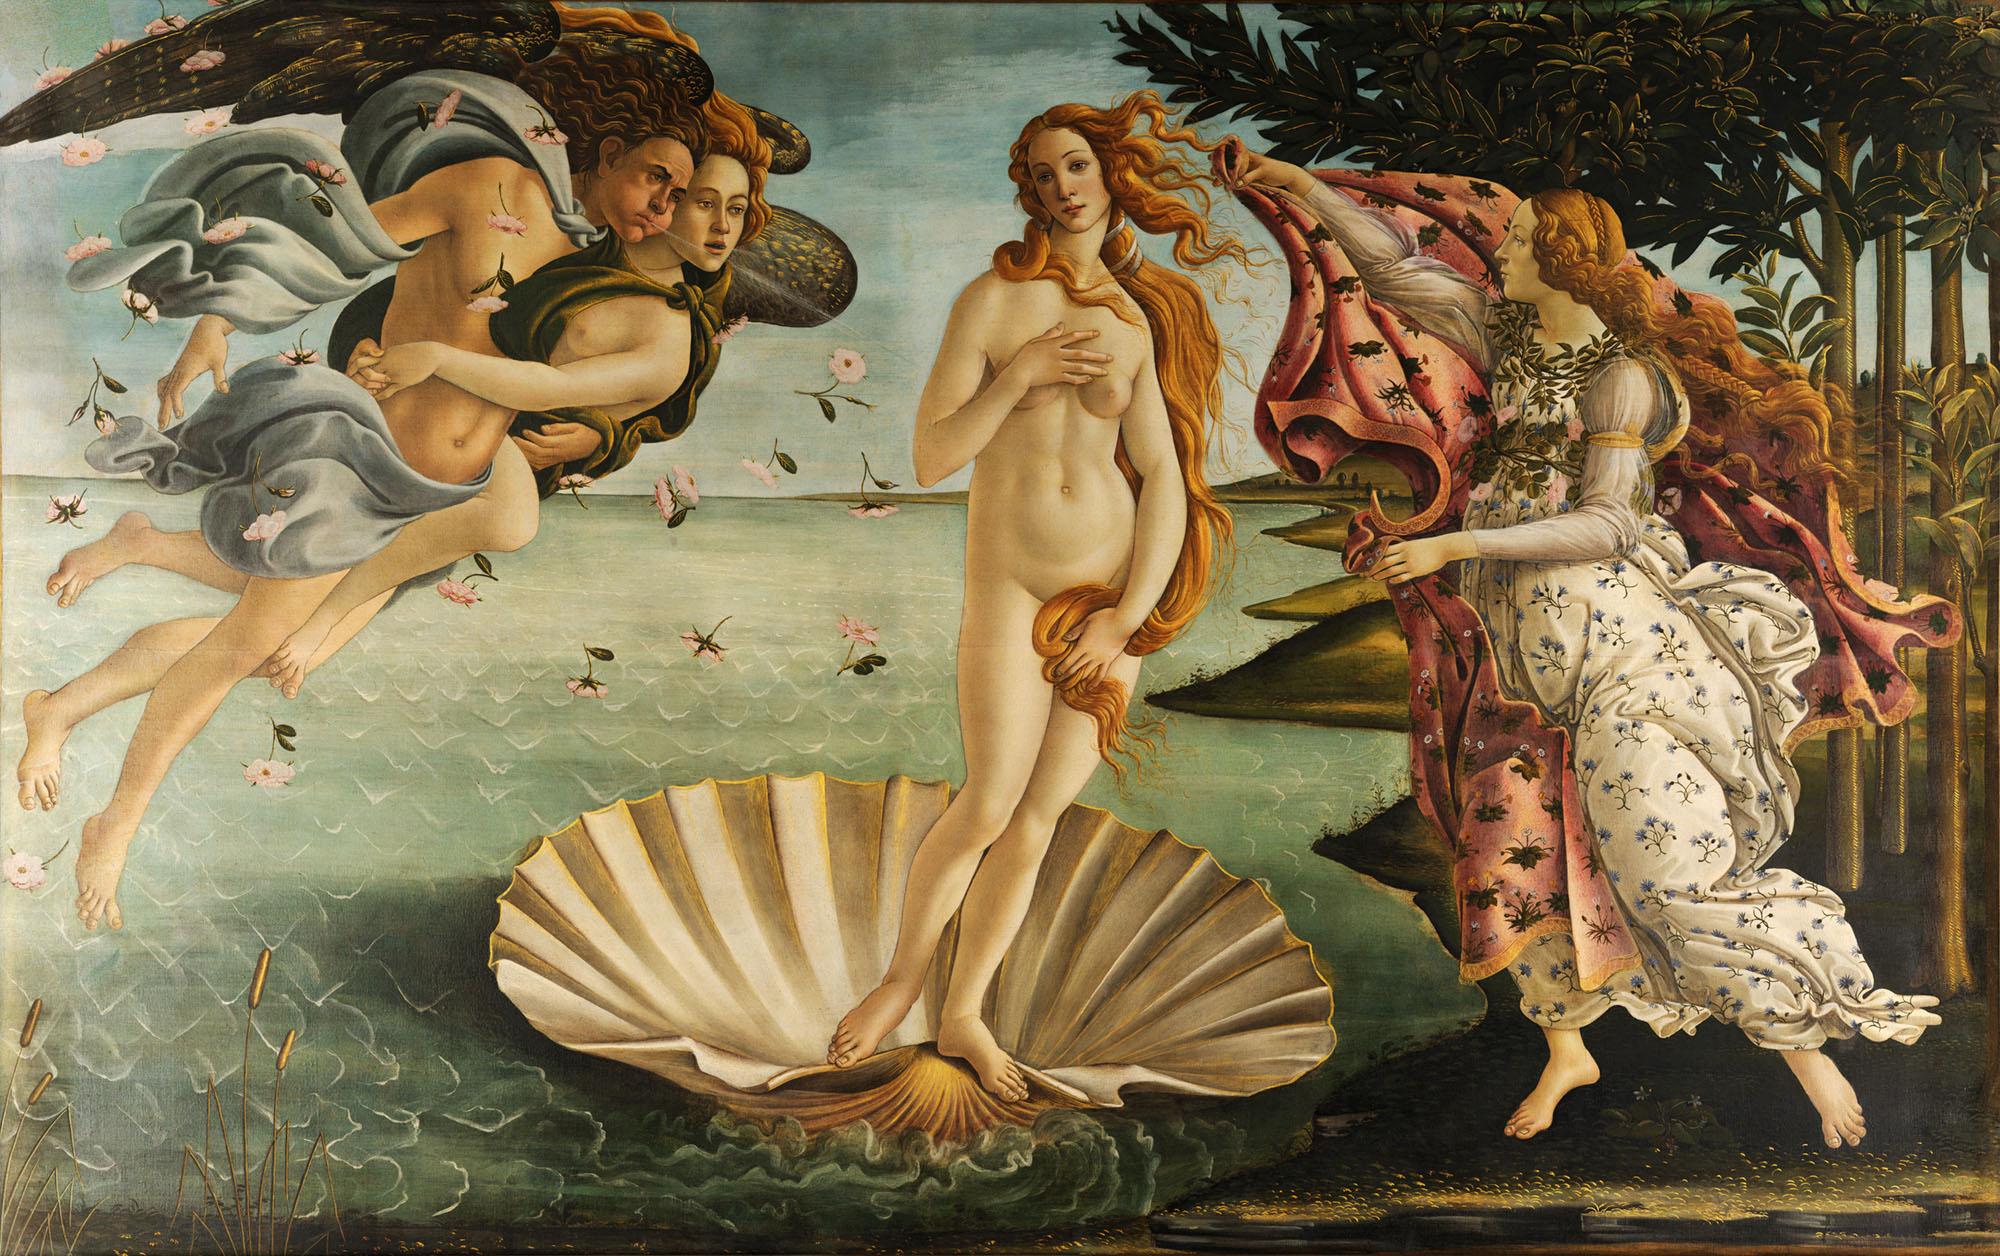 venus - Sandro_Botticelli_-_La_nascita_di_Venere_-_Google_Art_Project_-_edited.jpg